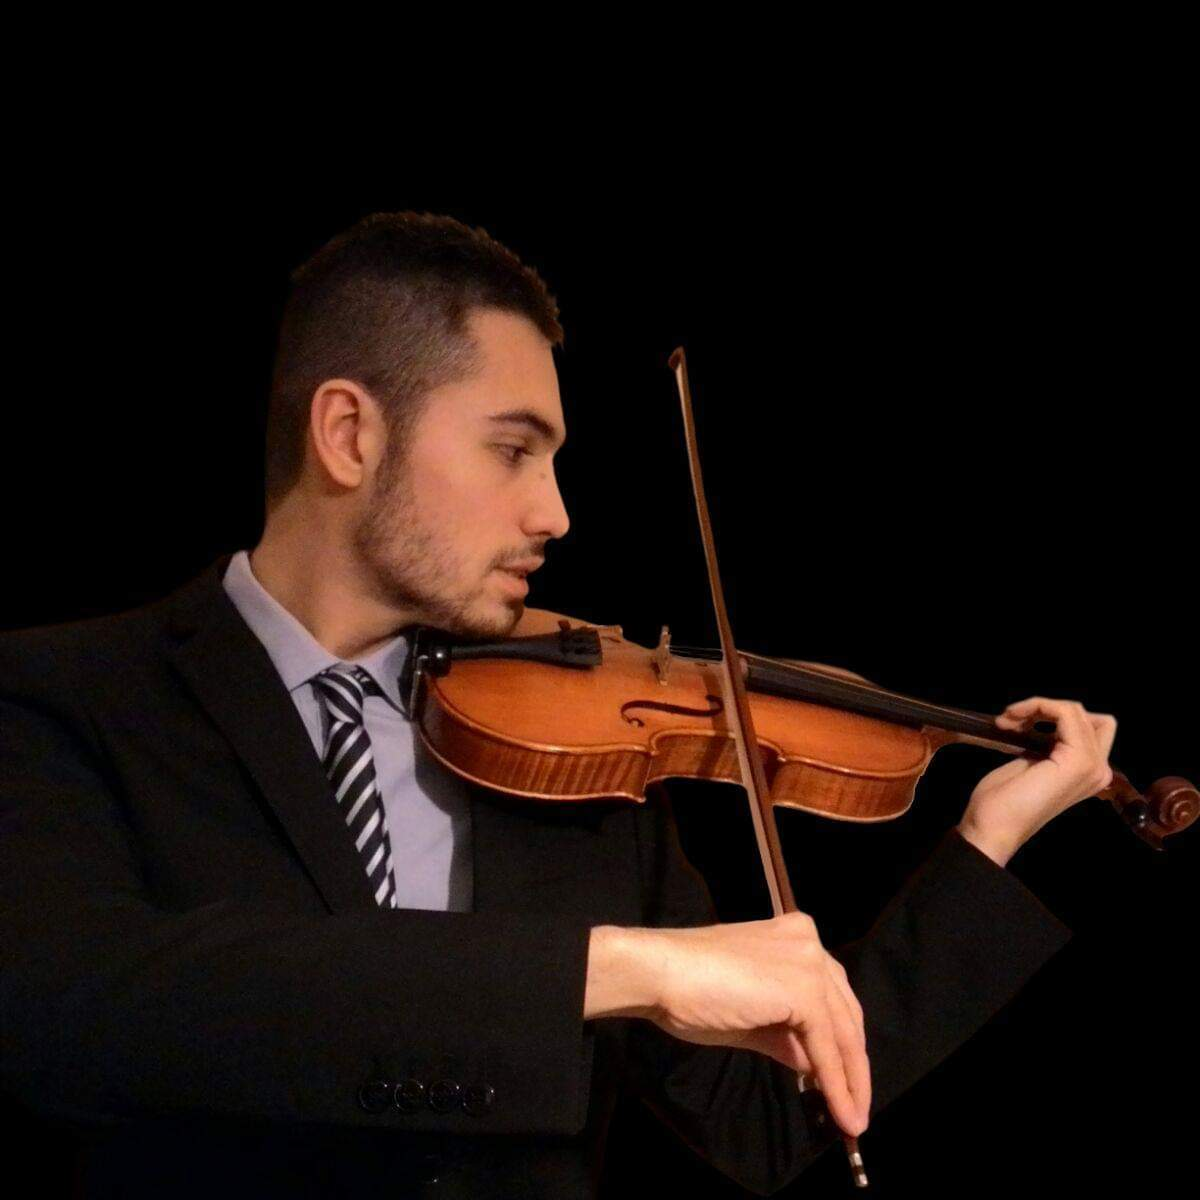 Ronaghi Stefano